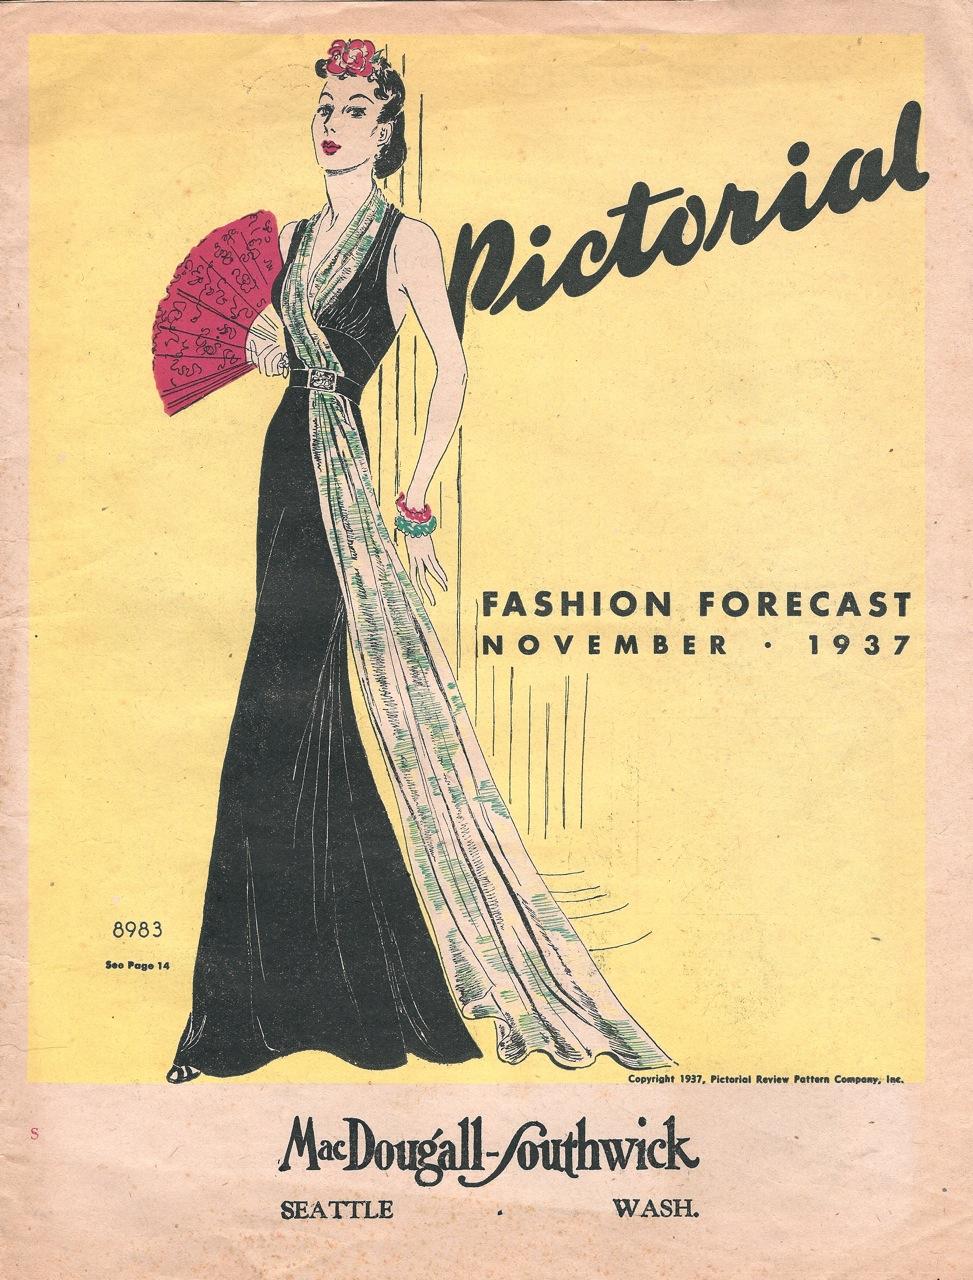 Pictorial Fashion Forecast November 1937